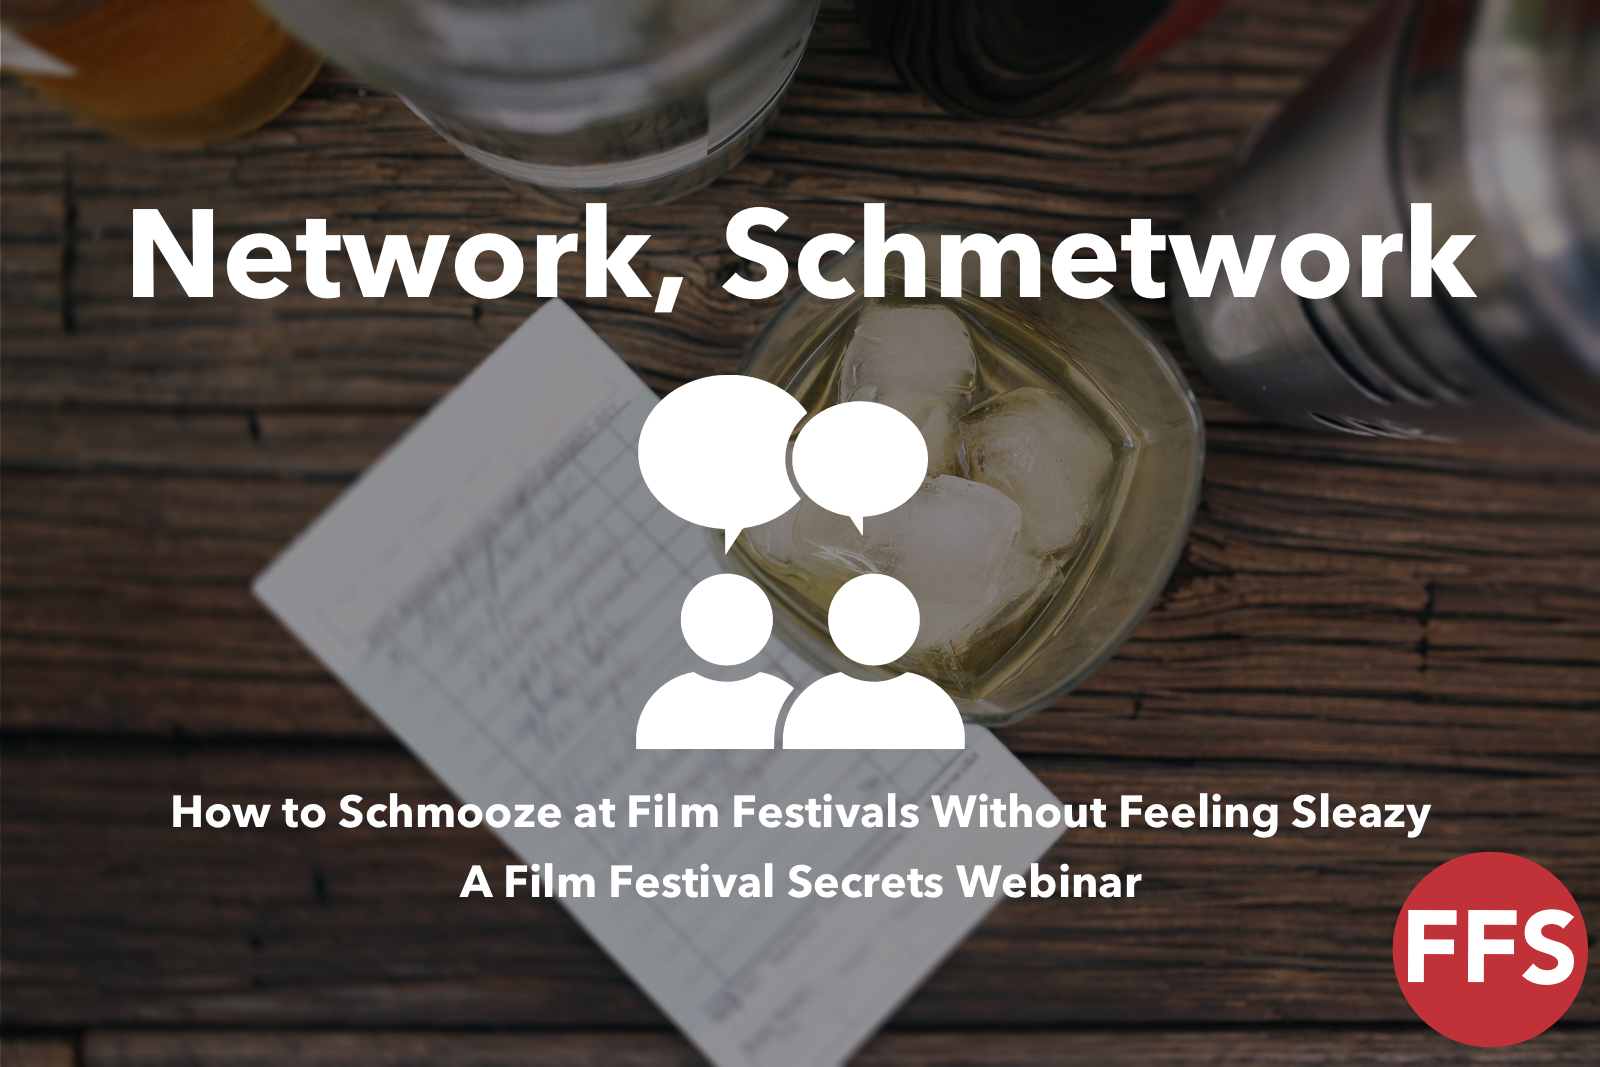 Network Schmetwork webinar